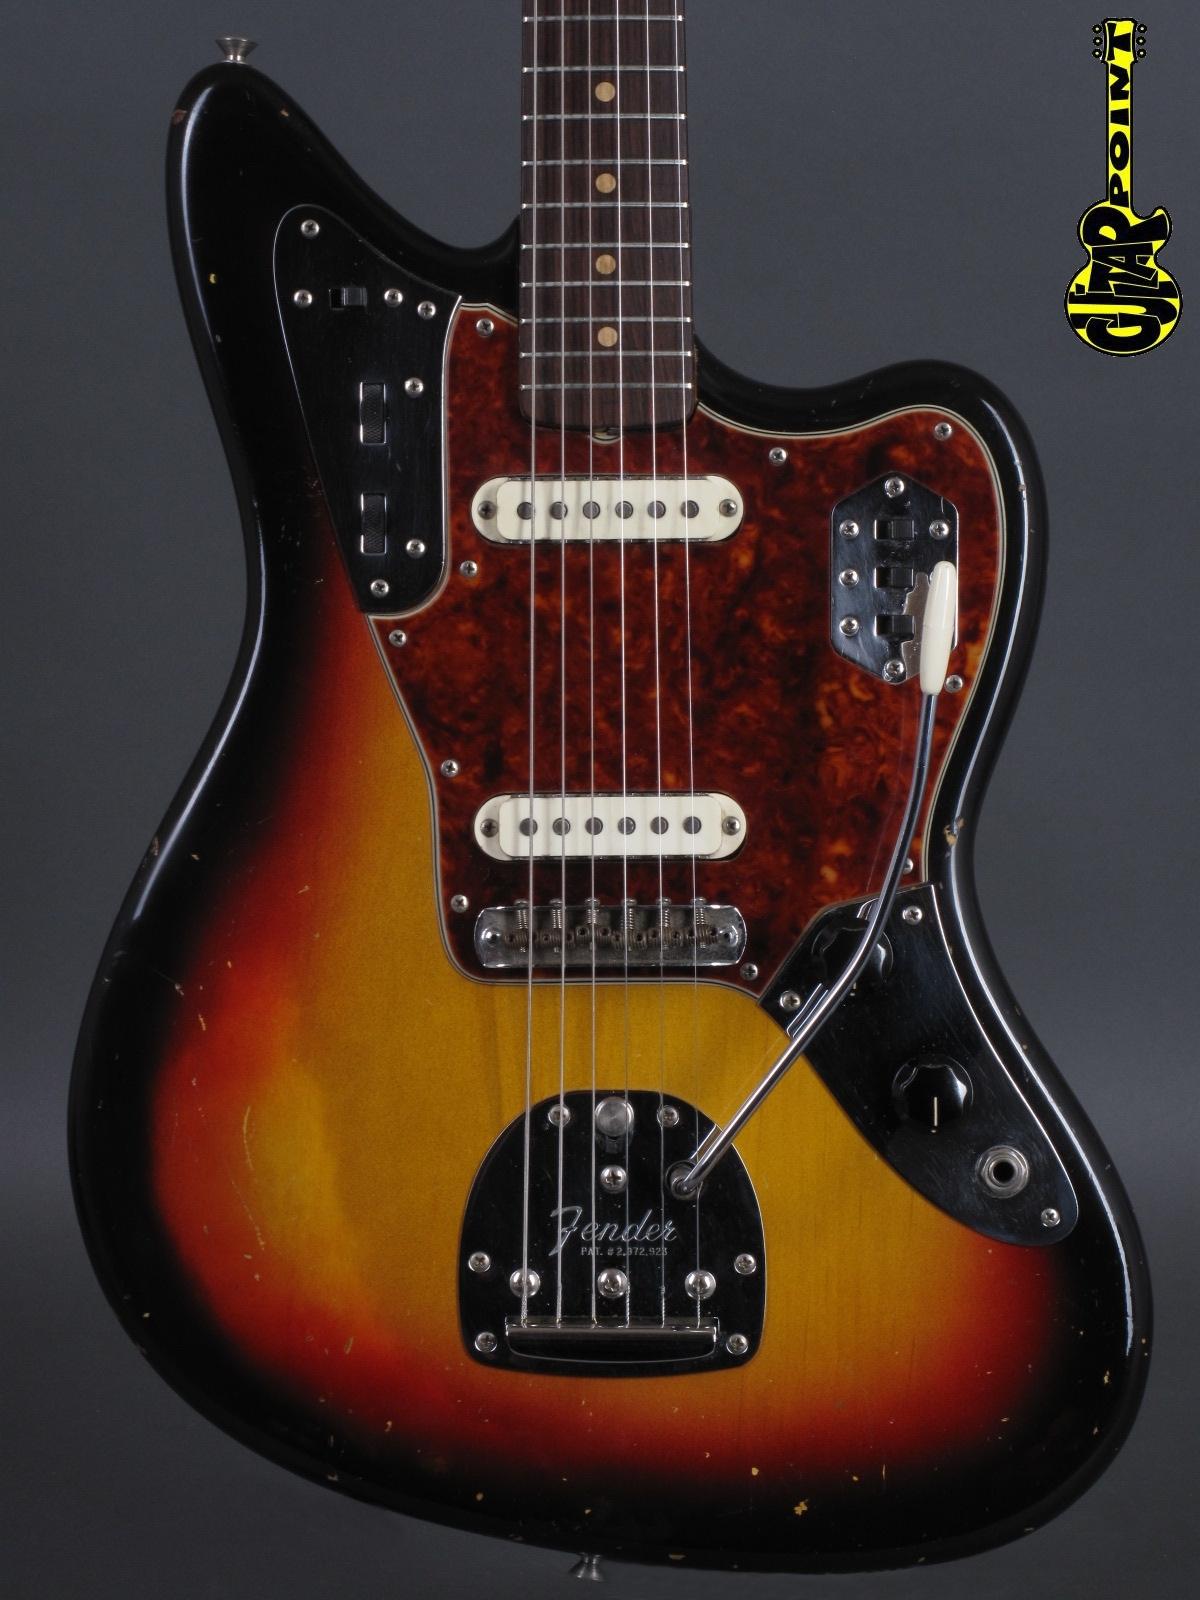 jaguar aged chimp guitar products img fender white refinished